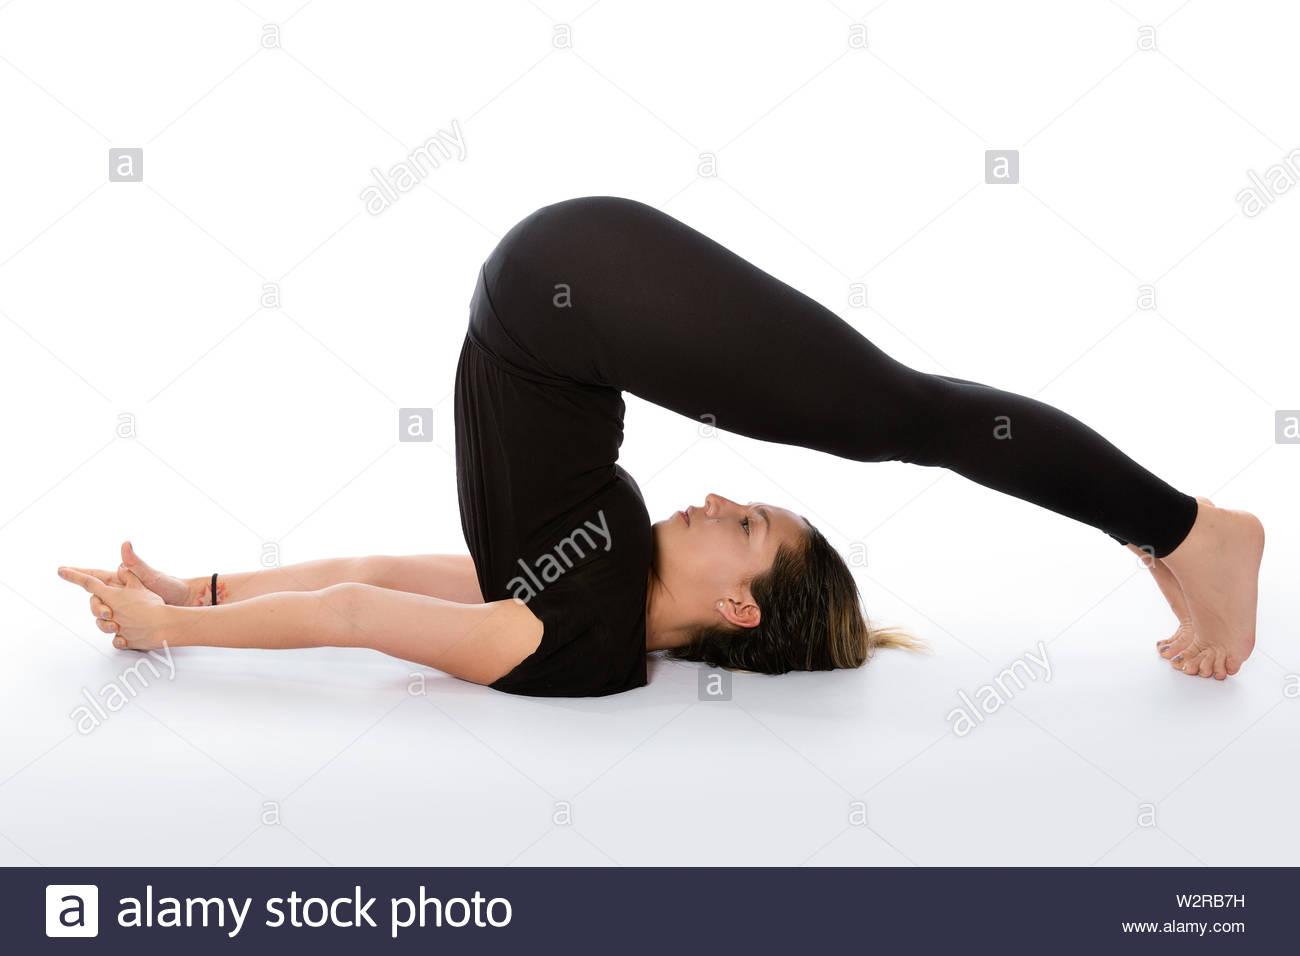 Halasana yoga pose (Plow Pose). Yoga poses woman isolated with white background. Yoga pose set. Mindfulness and Spiritually concept. Girl practicing H - Stock Image